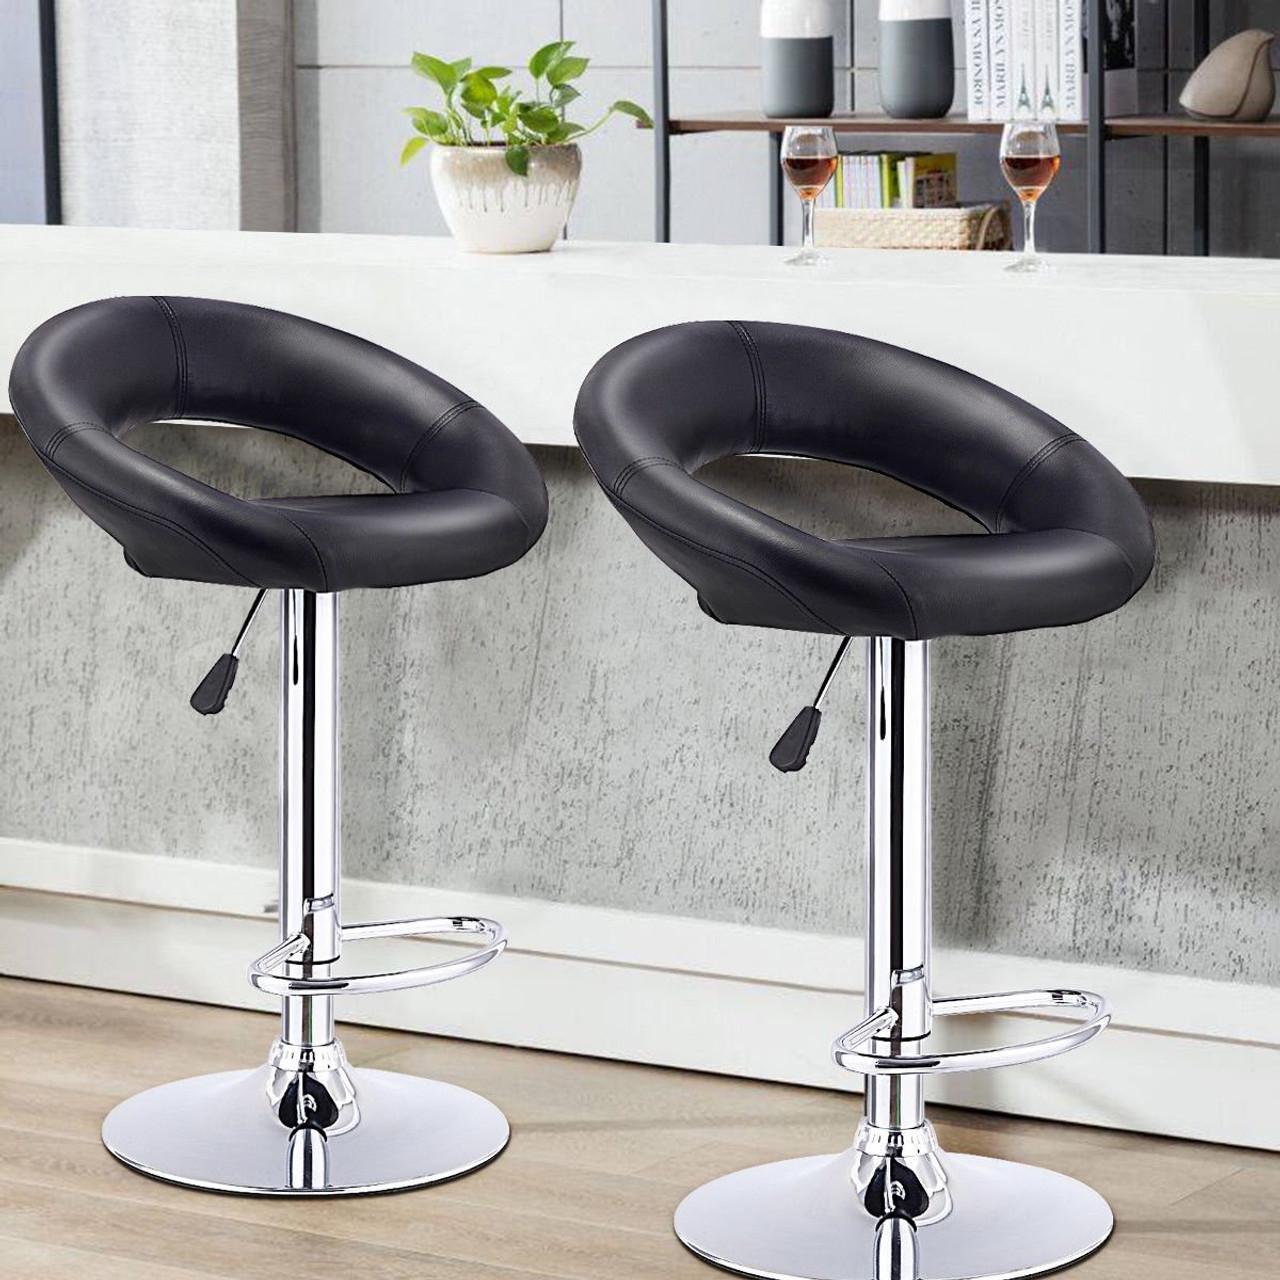 Set Of 2 Bar Stools Adjustable Pu Leather Barstools Swivel Pub Chairs Black Hw53839bk By Cw